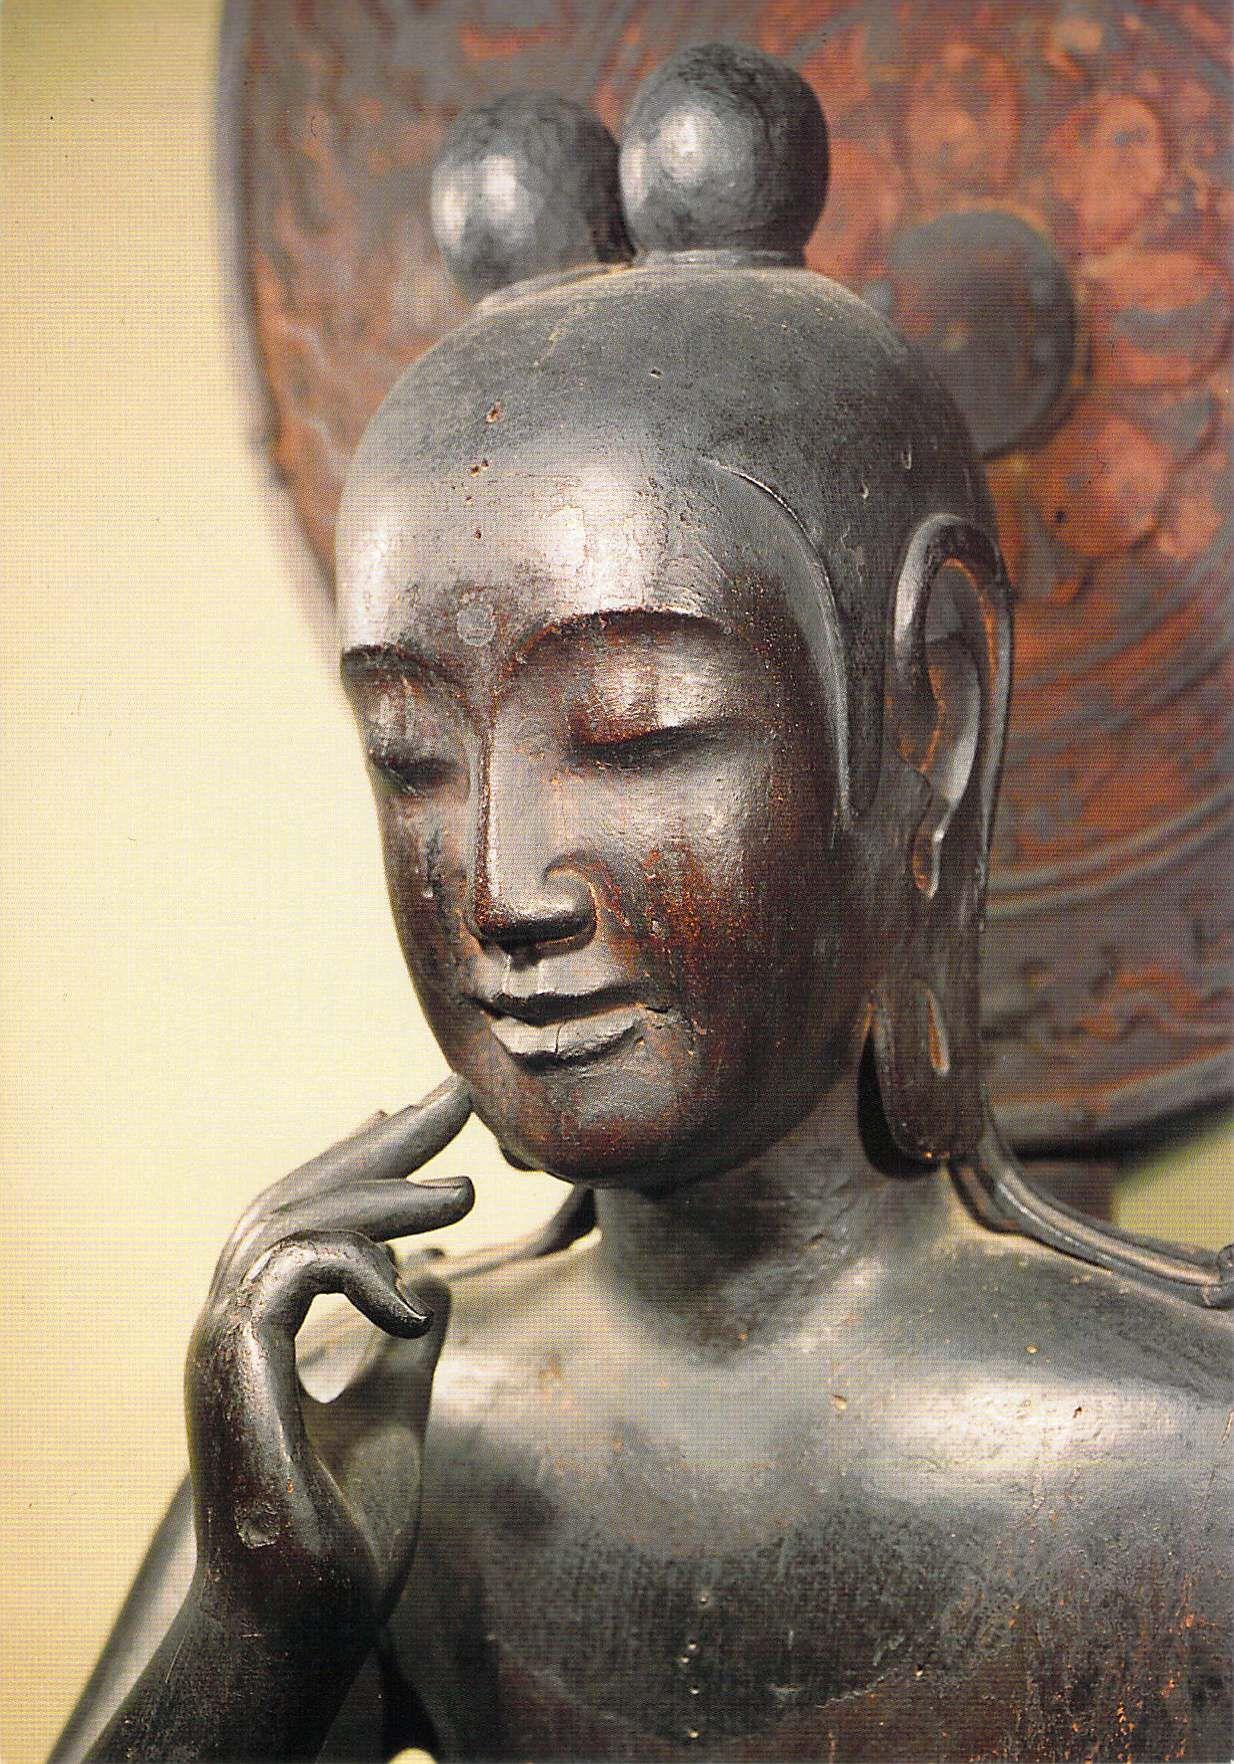 the camphor wood statue of miroku is a